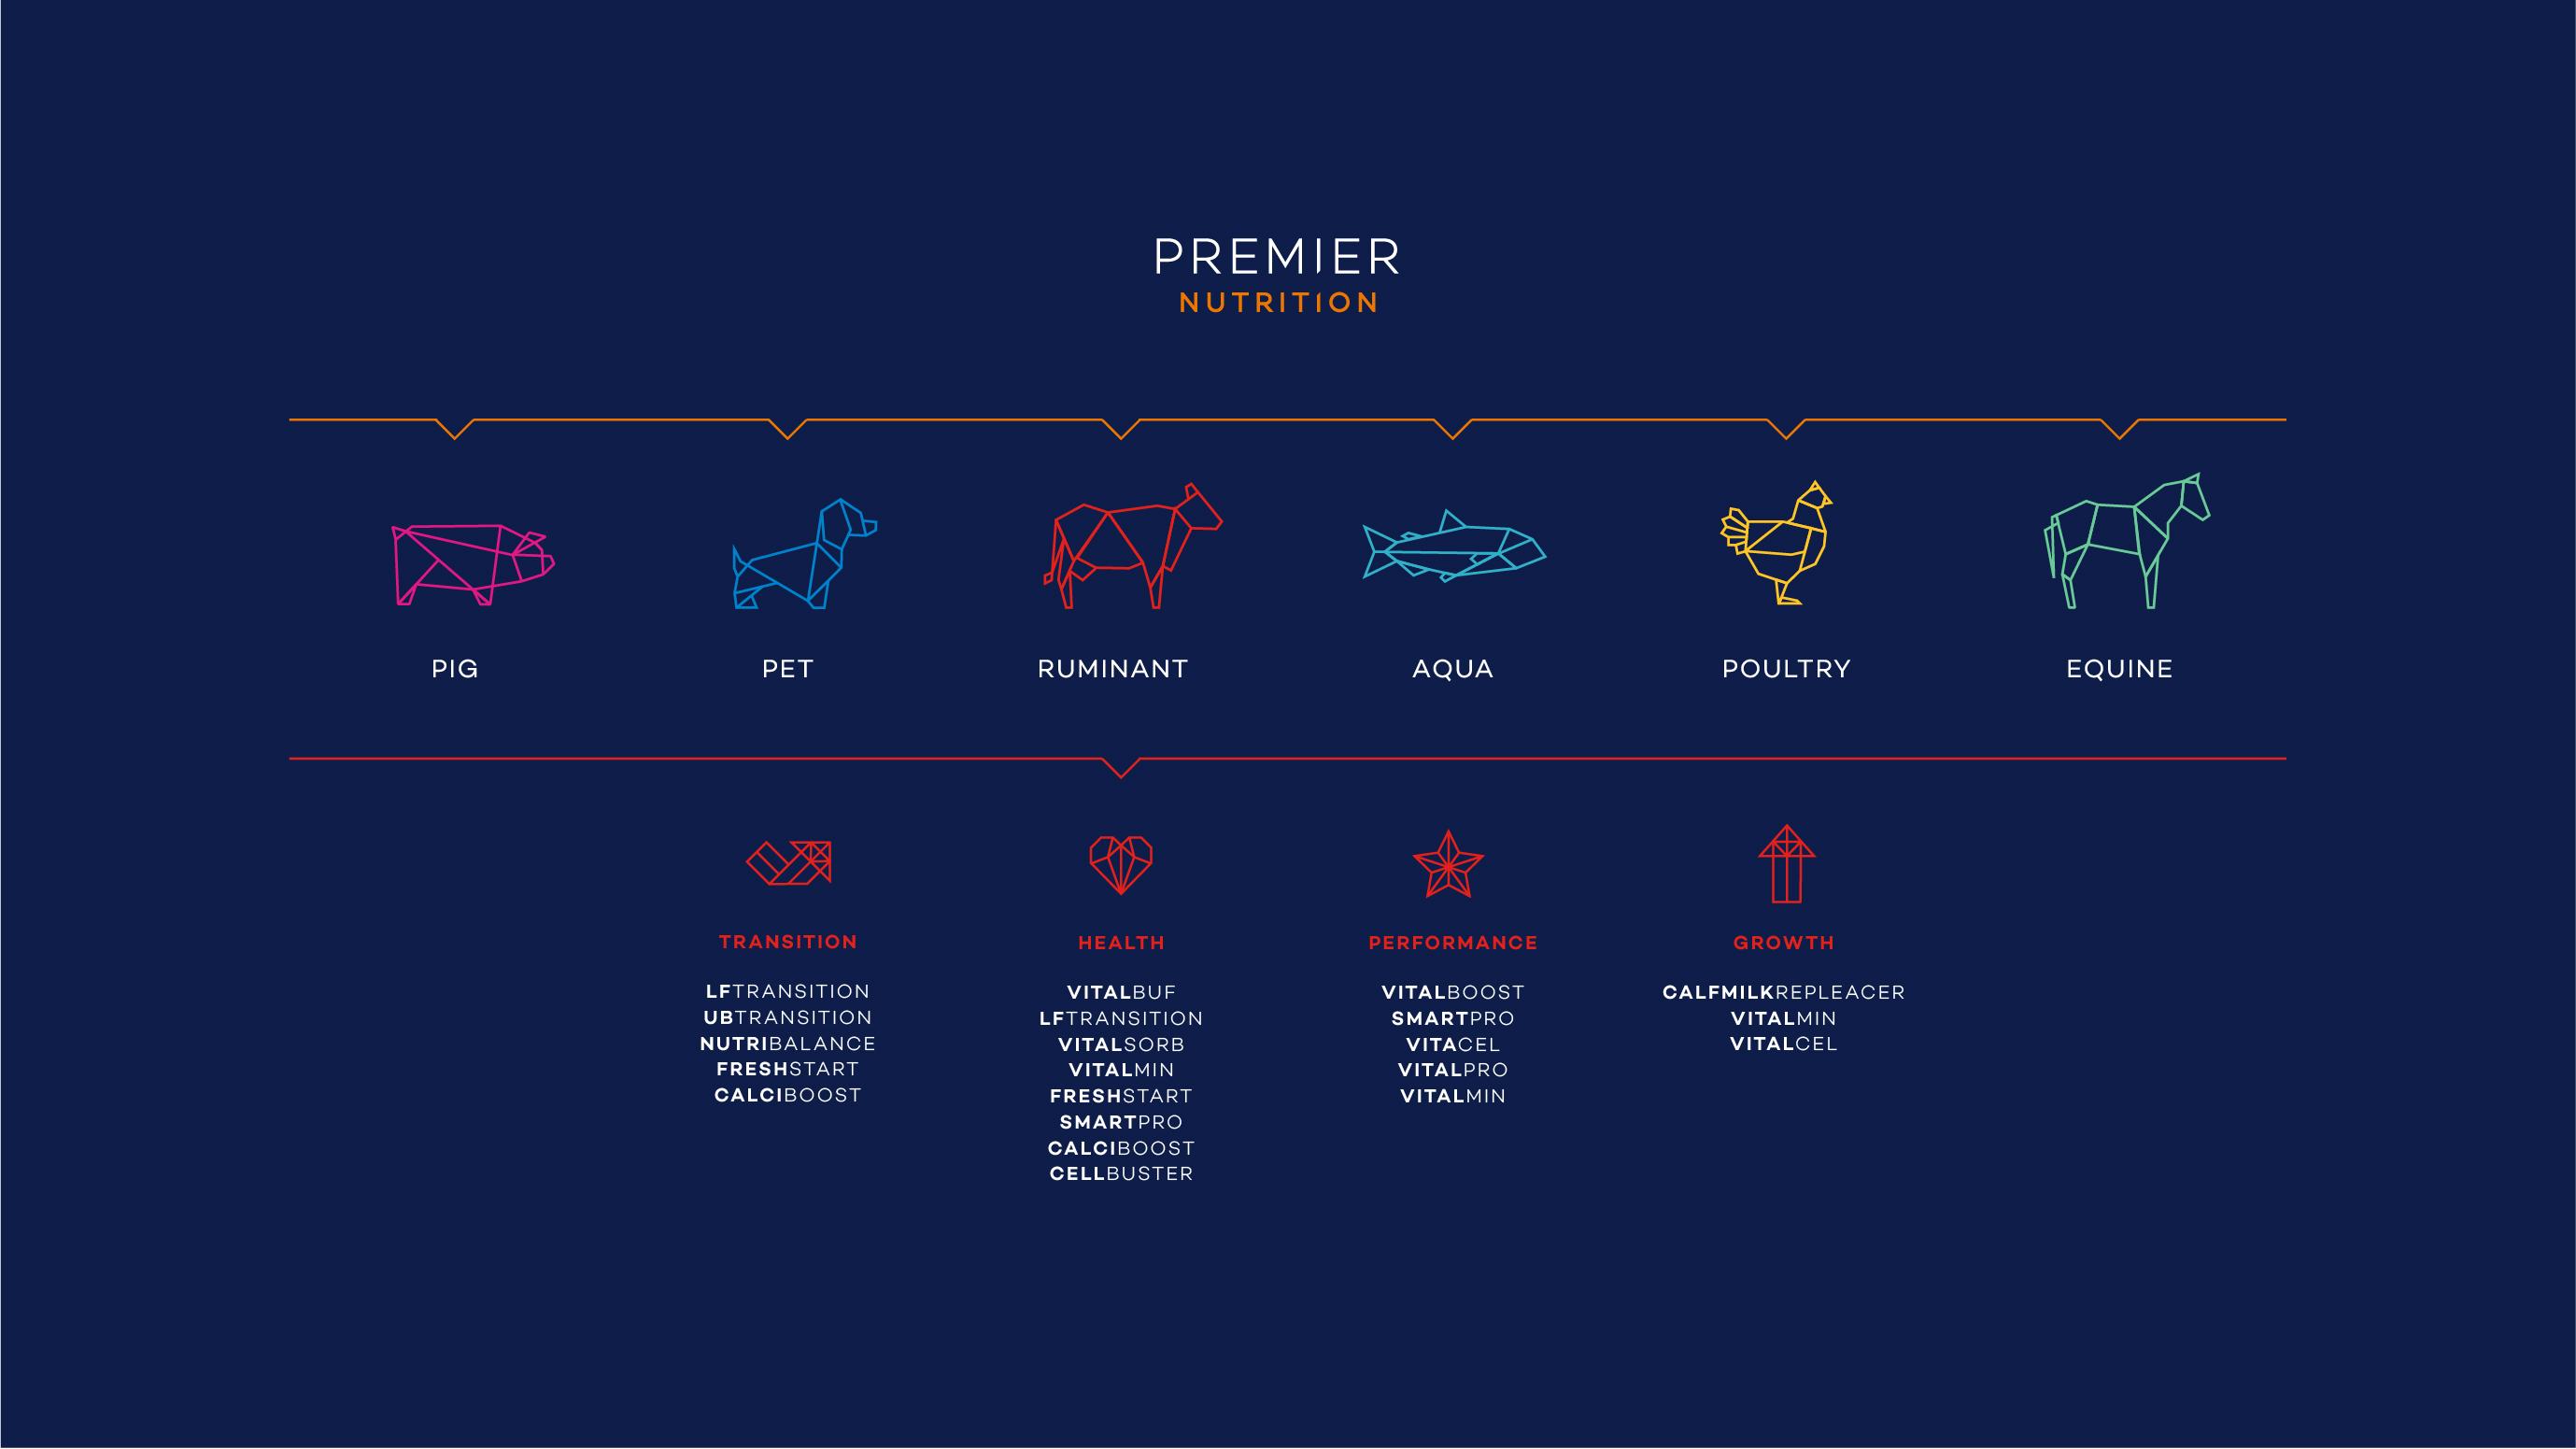 Premier Nutrition species